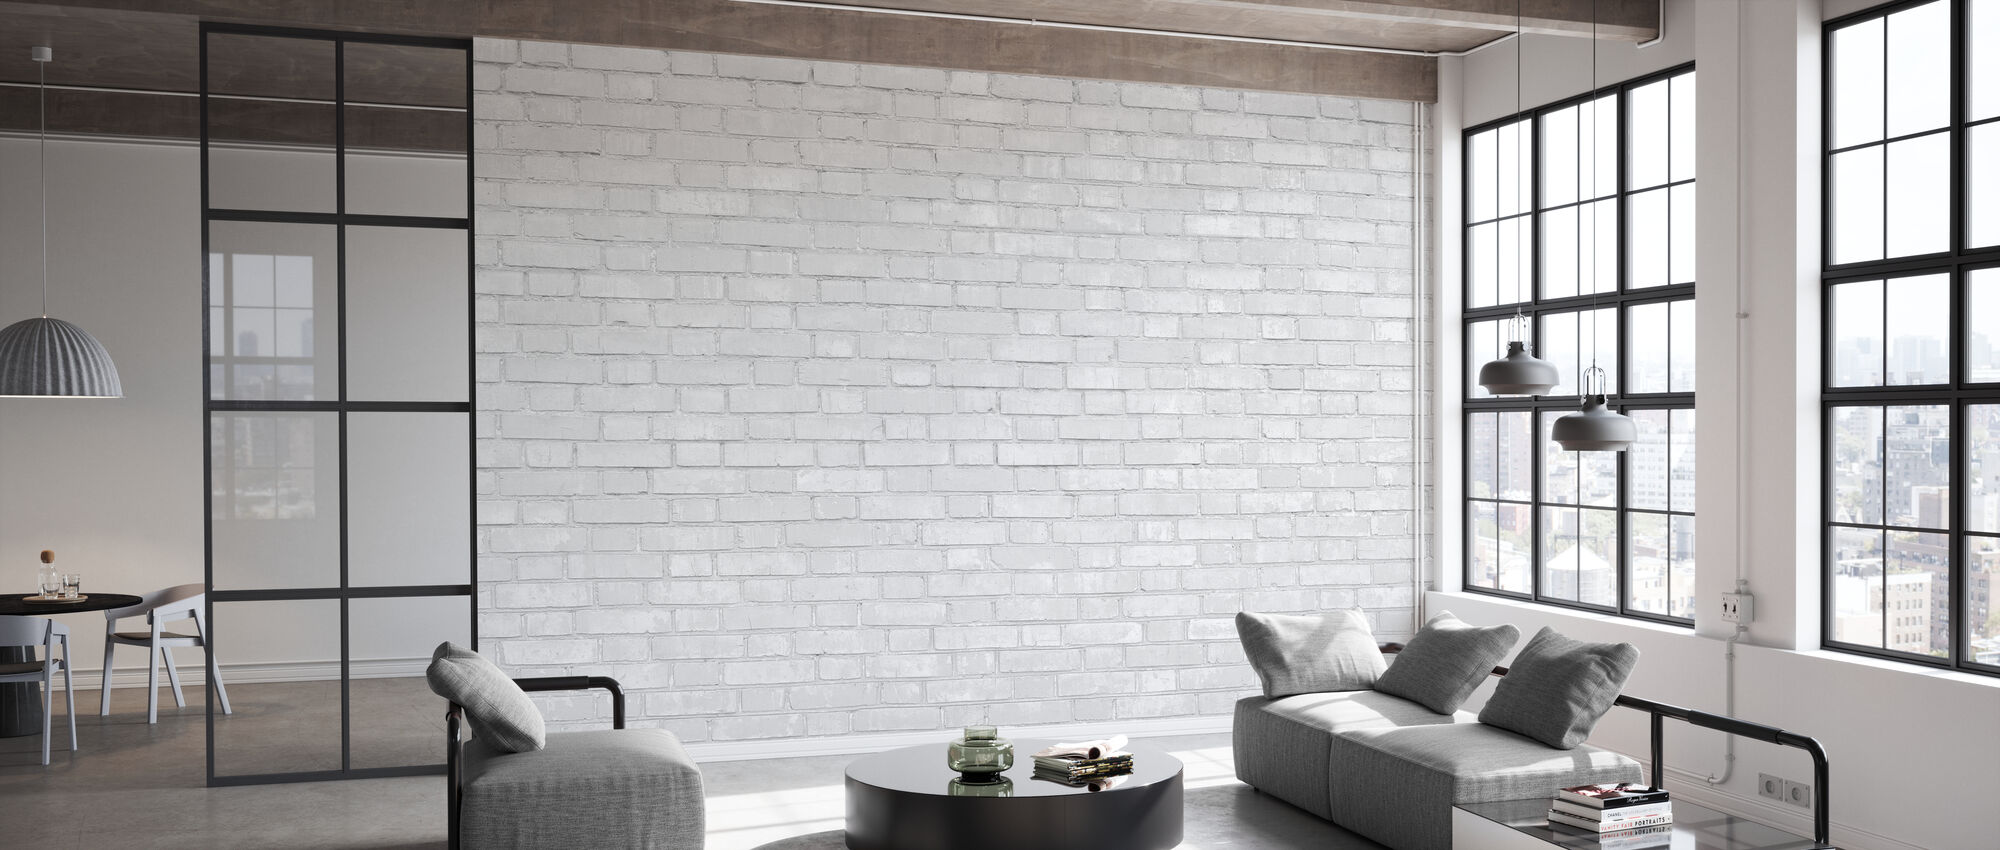 White Brick Wall - Wallpaper - Office